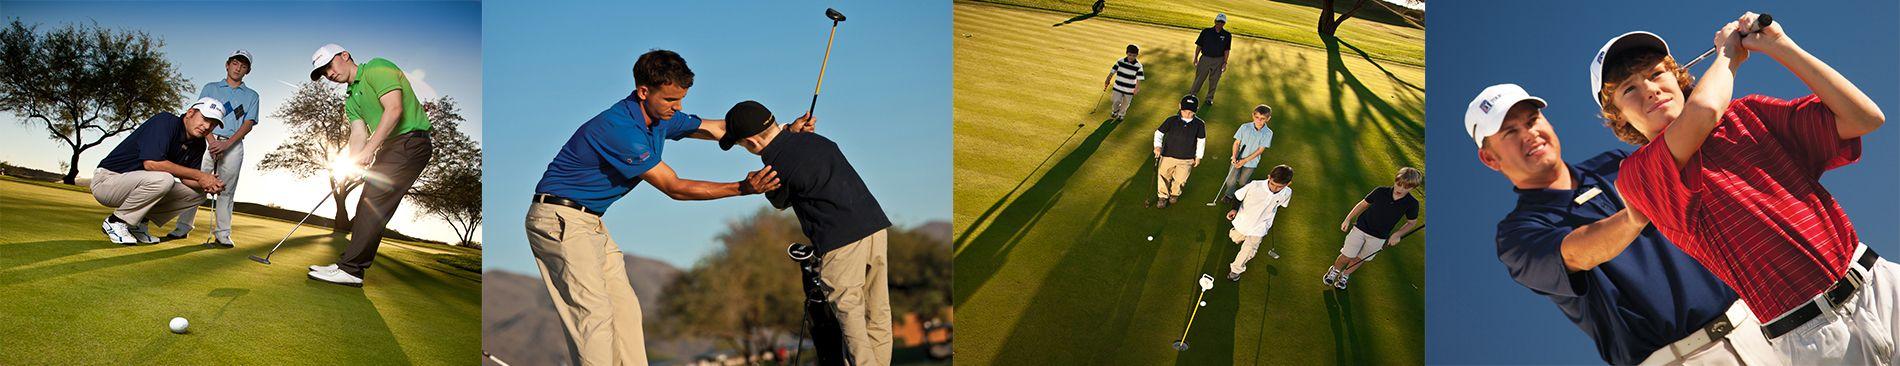 PGA TOURAcademy Junior Golf Camps